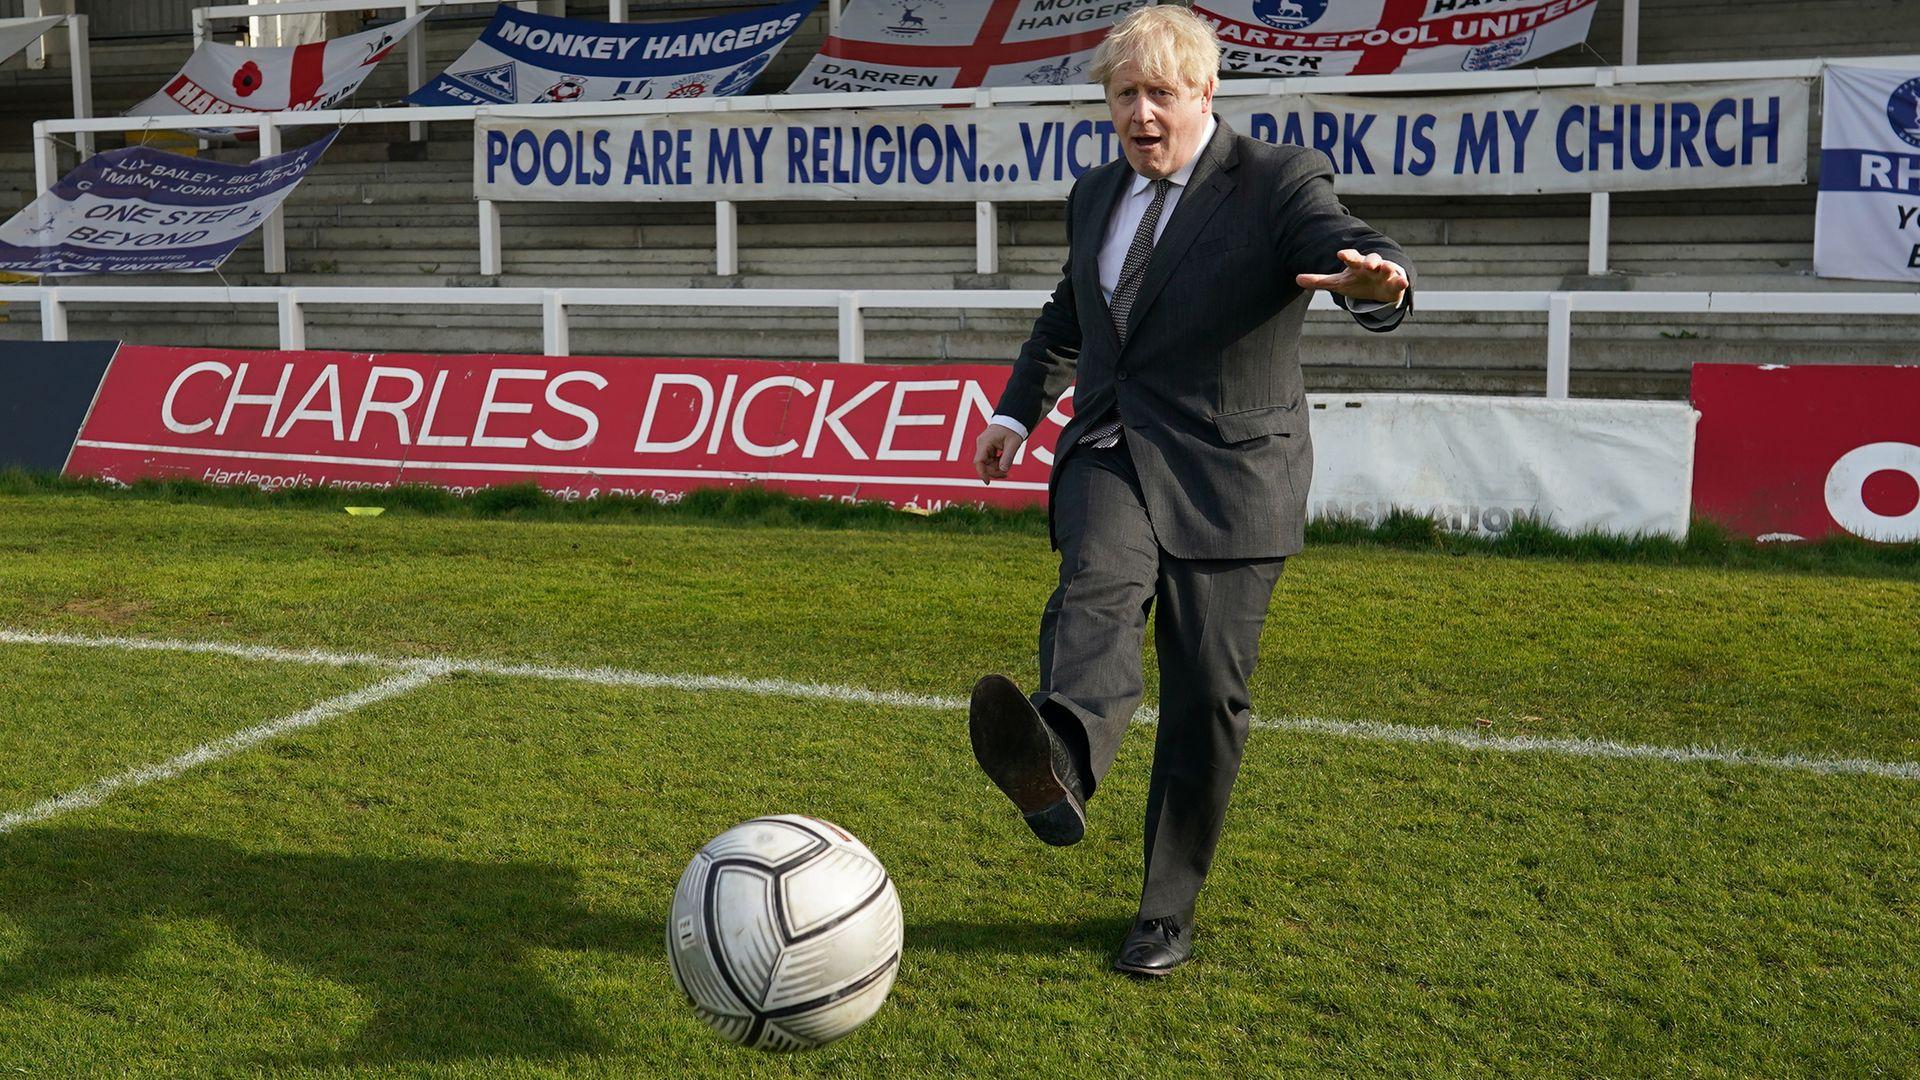 Prime Minister Boris Johnson kicks a football during a visit to the Hartlepool United Football Club - Credit: PA